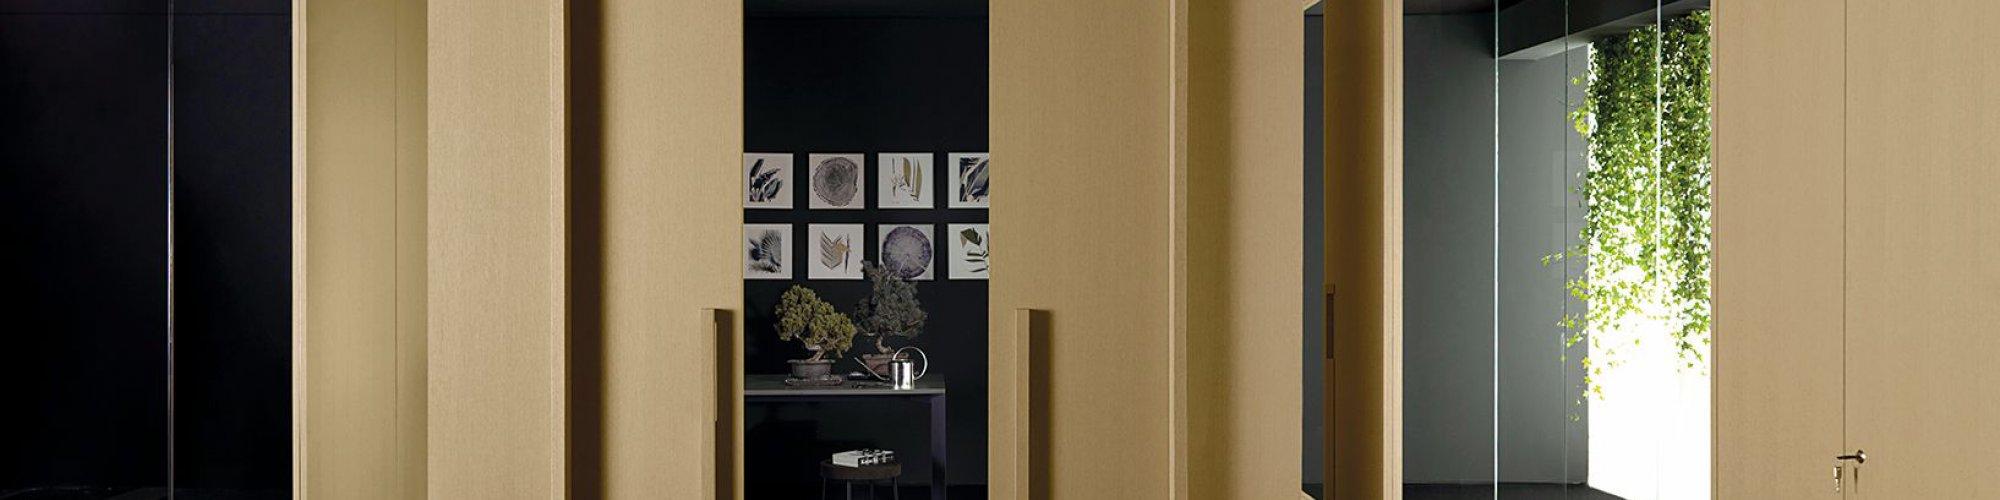 Citterio introduceert Wood Wall